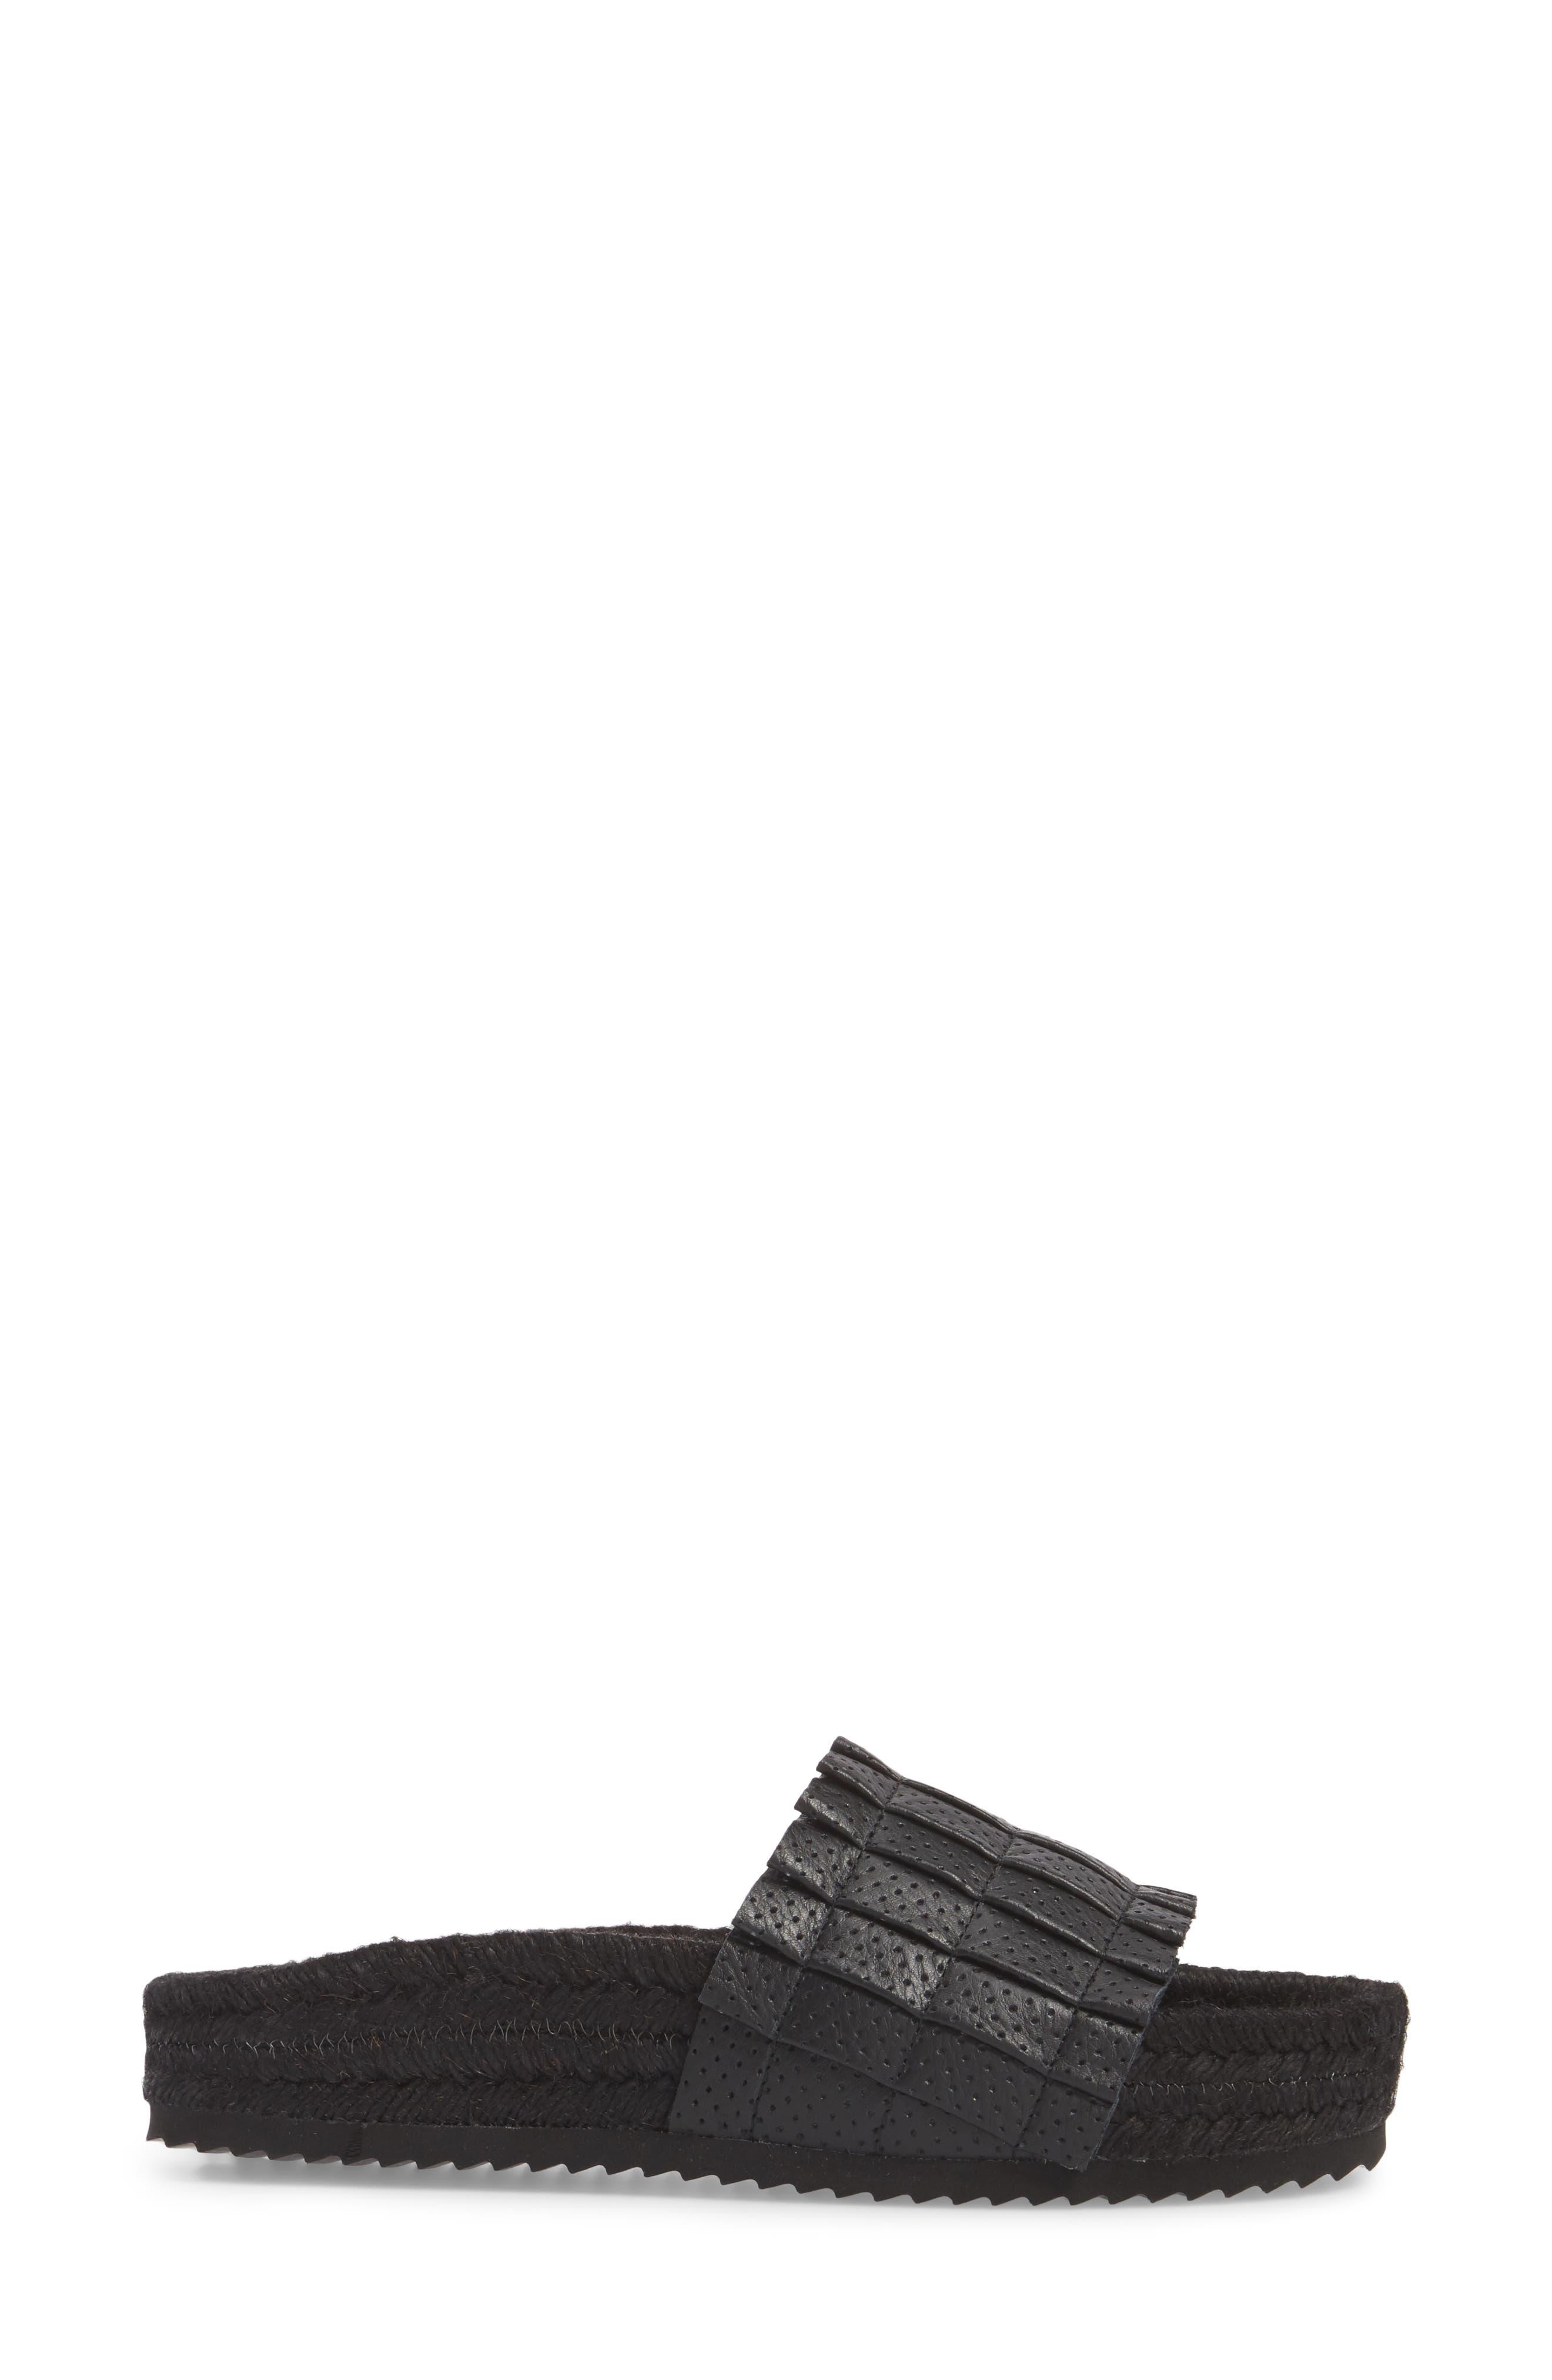 Island Time Espadrille Slide Sandal,                             Alternate thumbnail 3, color,                             Black